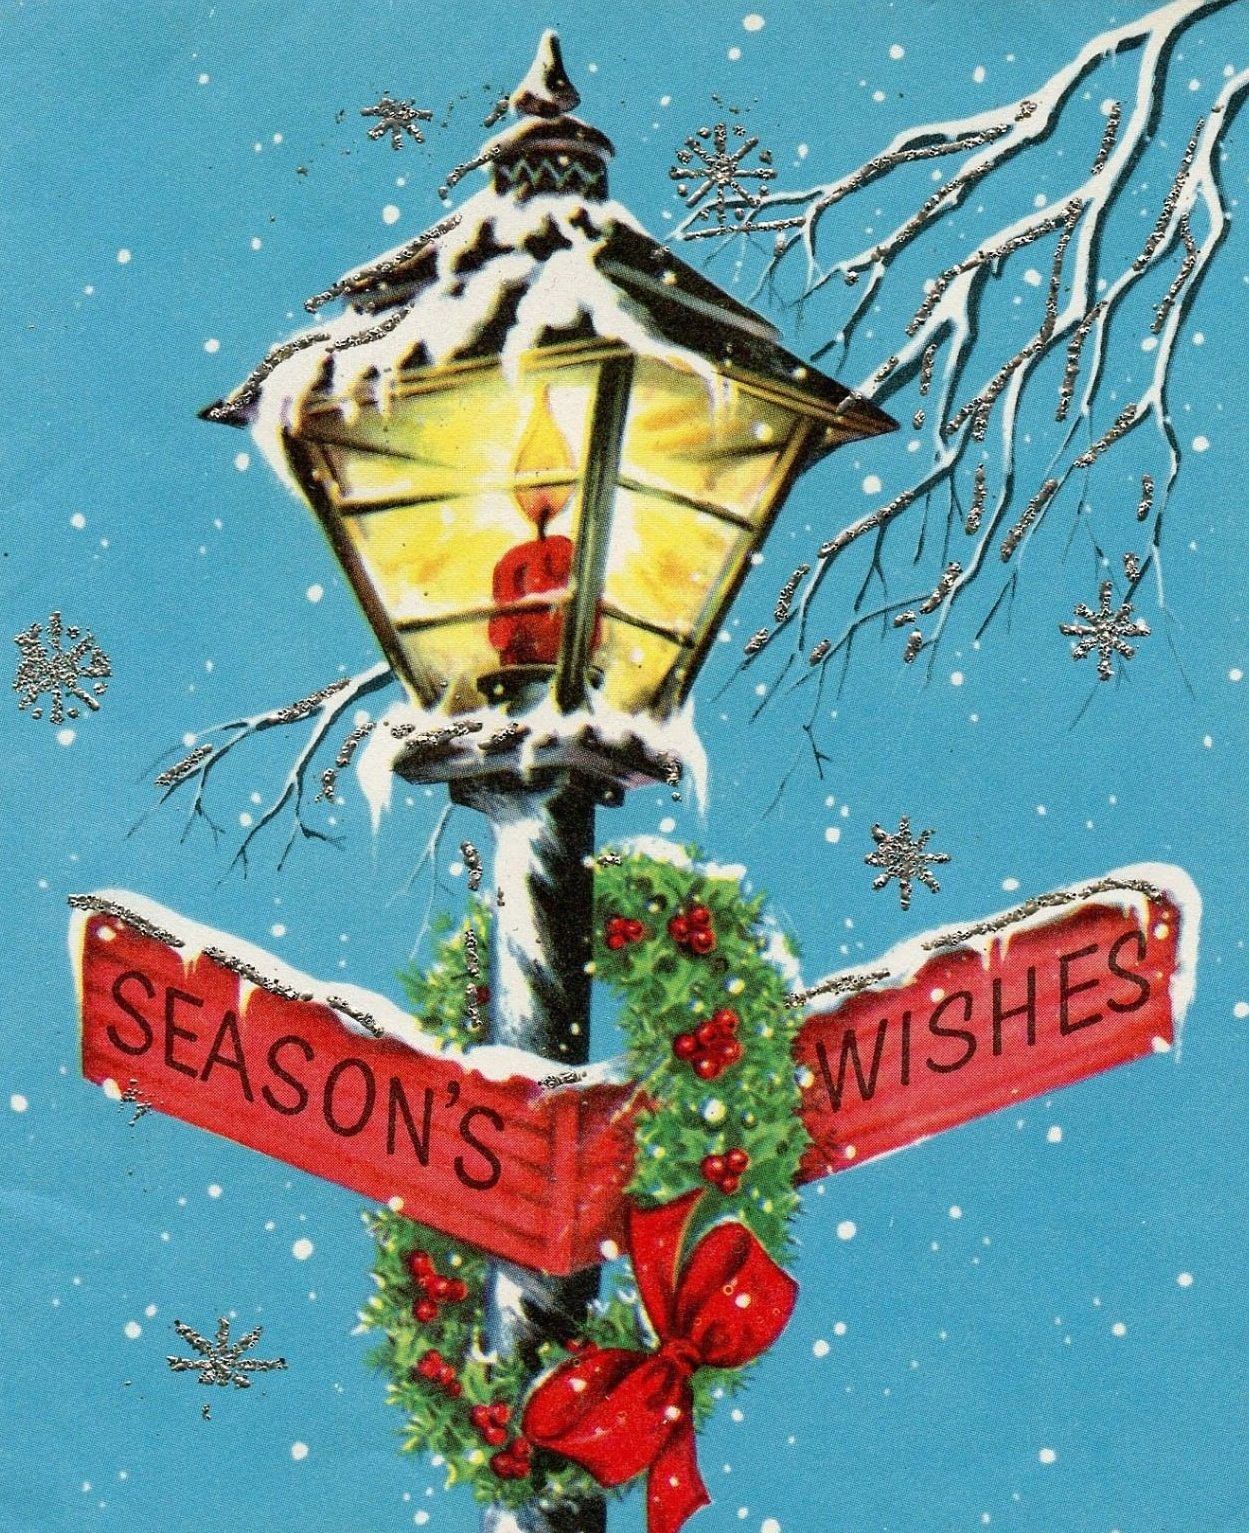 Pin By Brenda Weller On Christmas